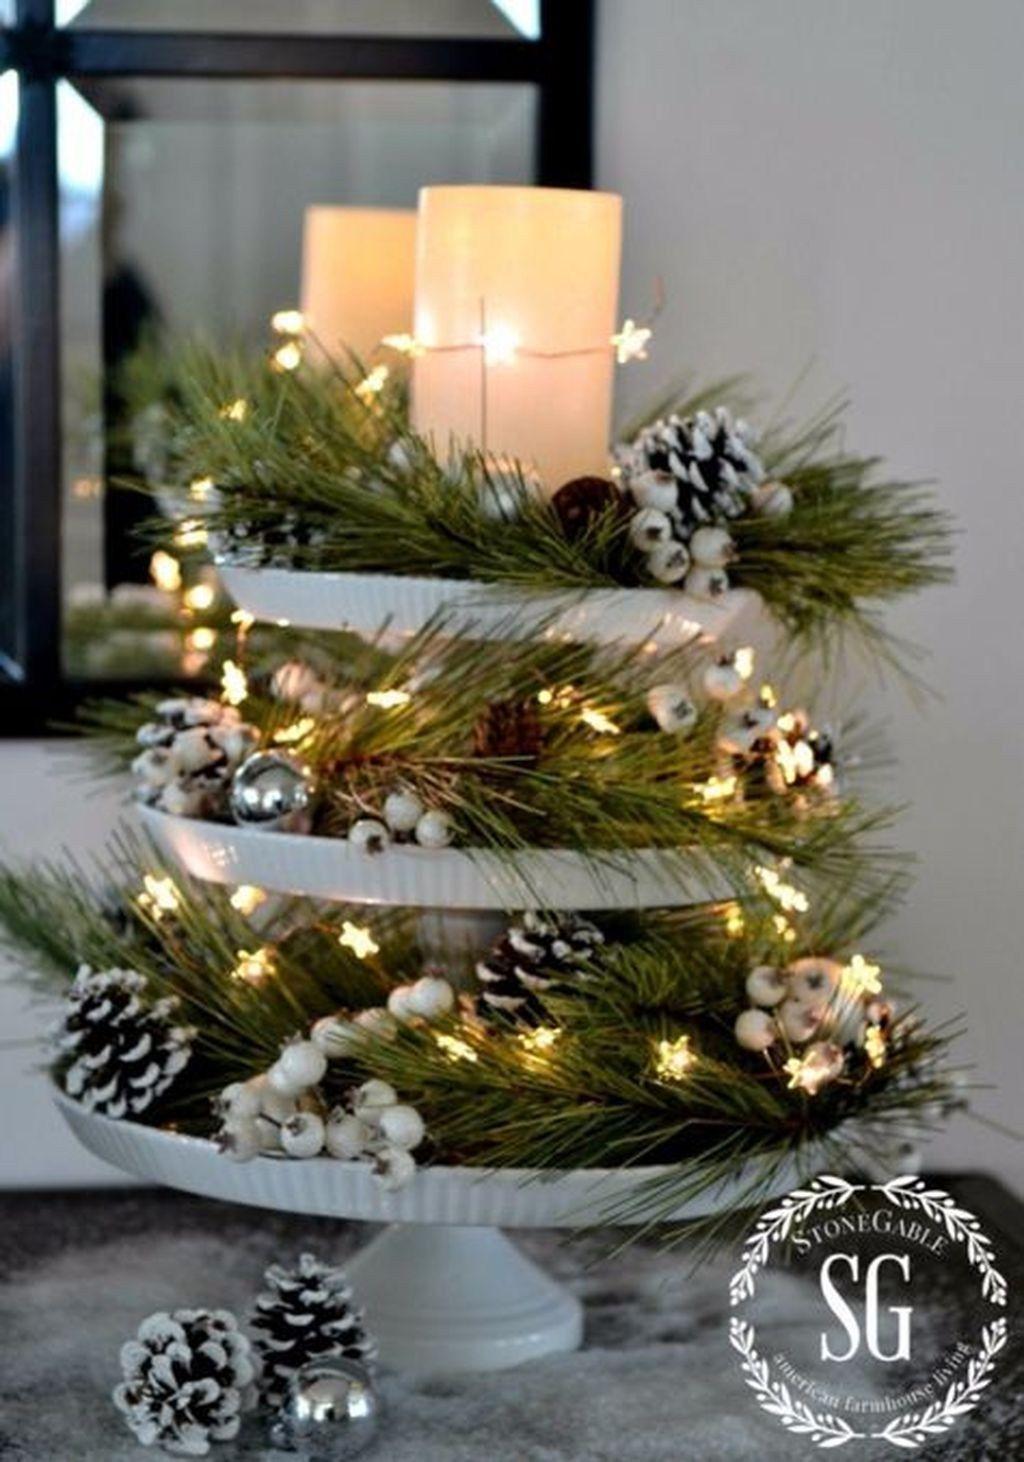 Cheap And Easy Christmas Centerpieces Ideas 04 Christmas Centerpieces Diy Decorating With Christmas Lights Diy Christmas Lights